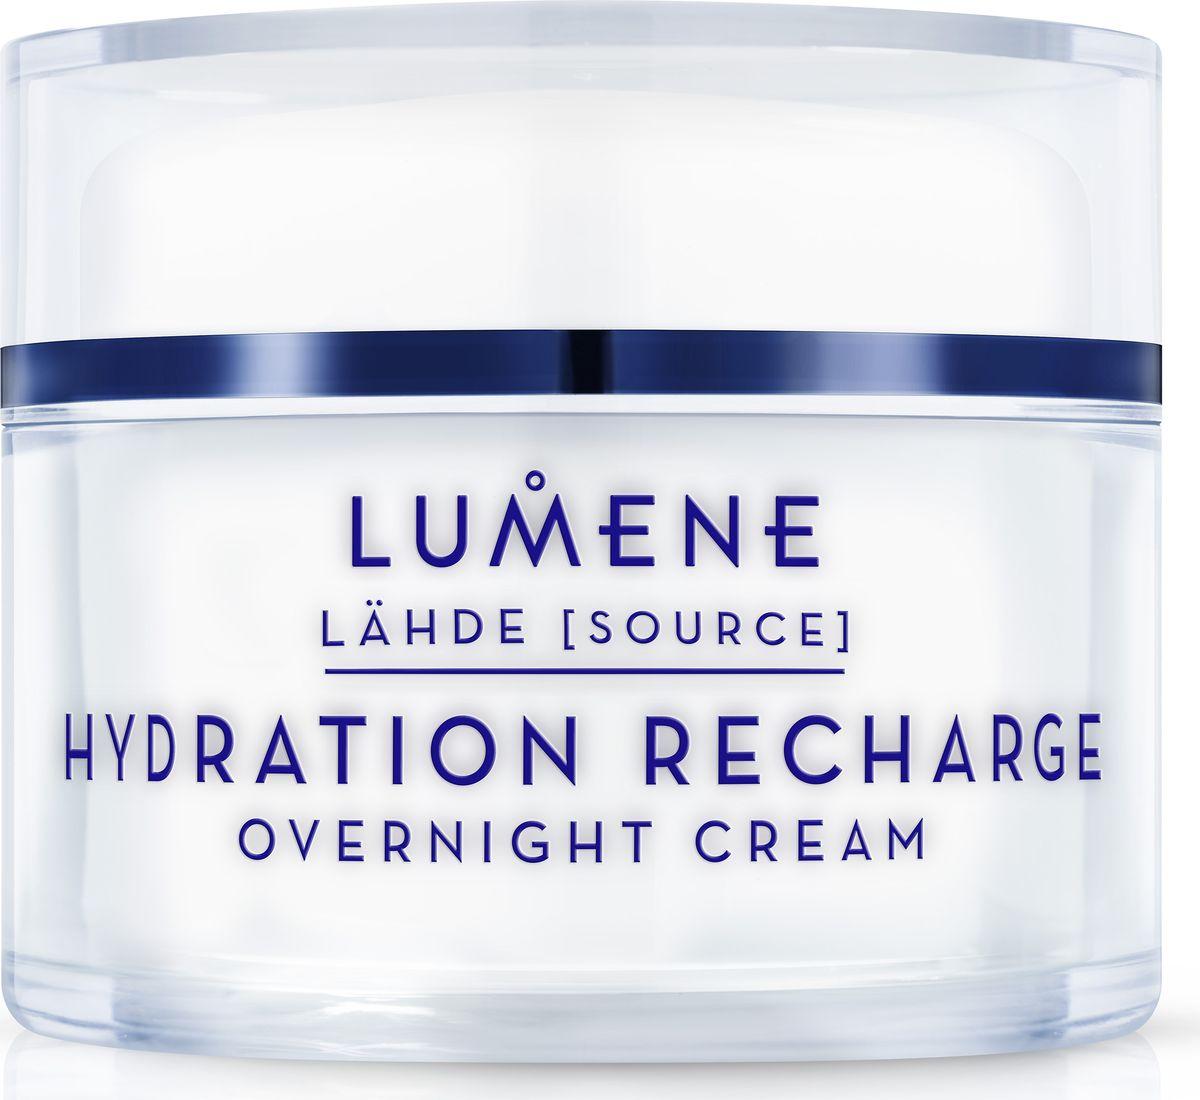 Lumene Lahde Ночной увлажняющий восстанавливающий крем, 50 мл lumene lahde hydration recharge overnight cream крем ночной увлажняющий восстанавливающий 50 мл